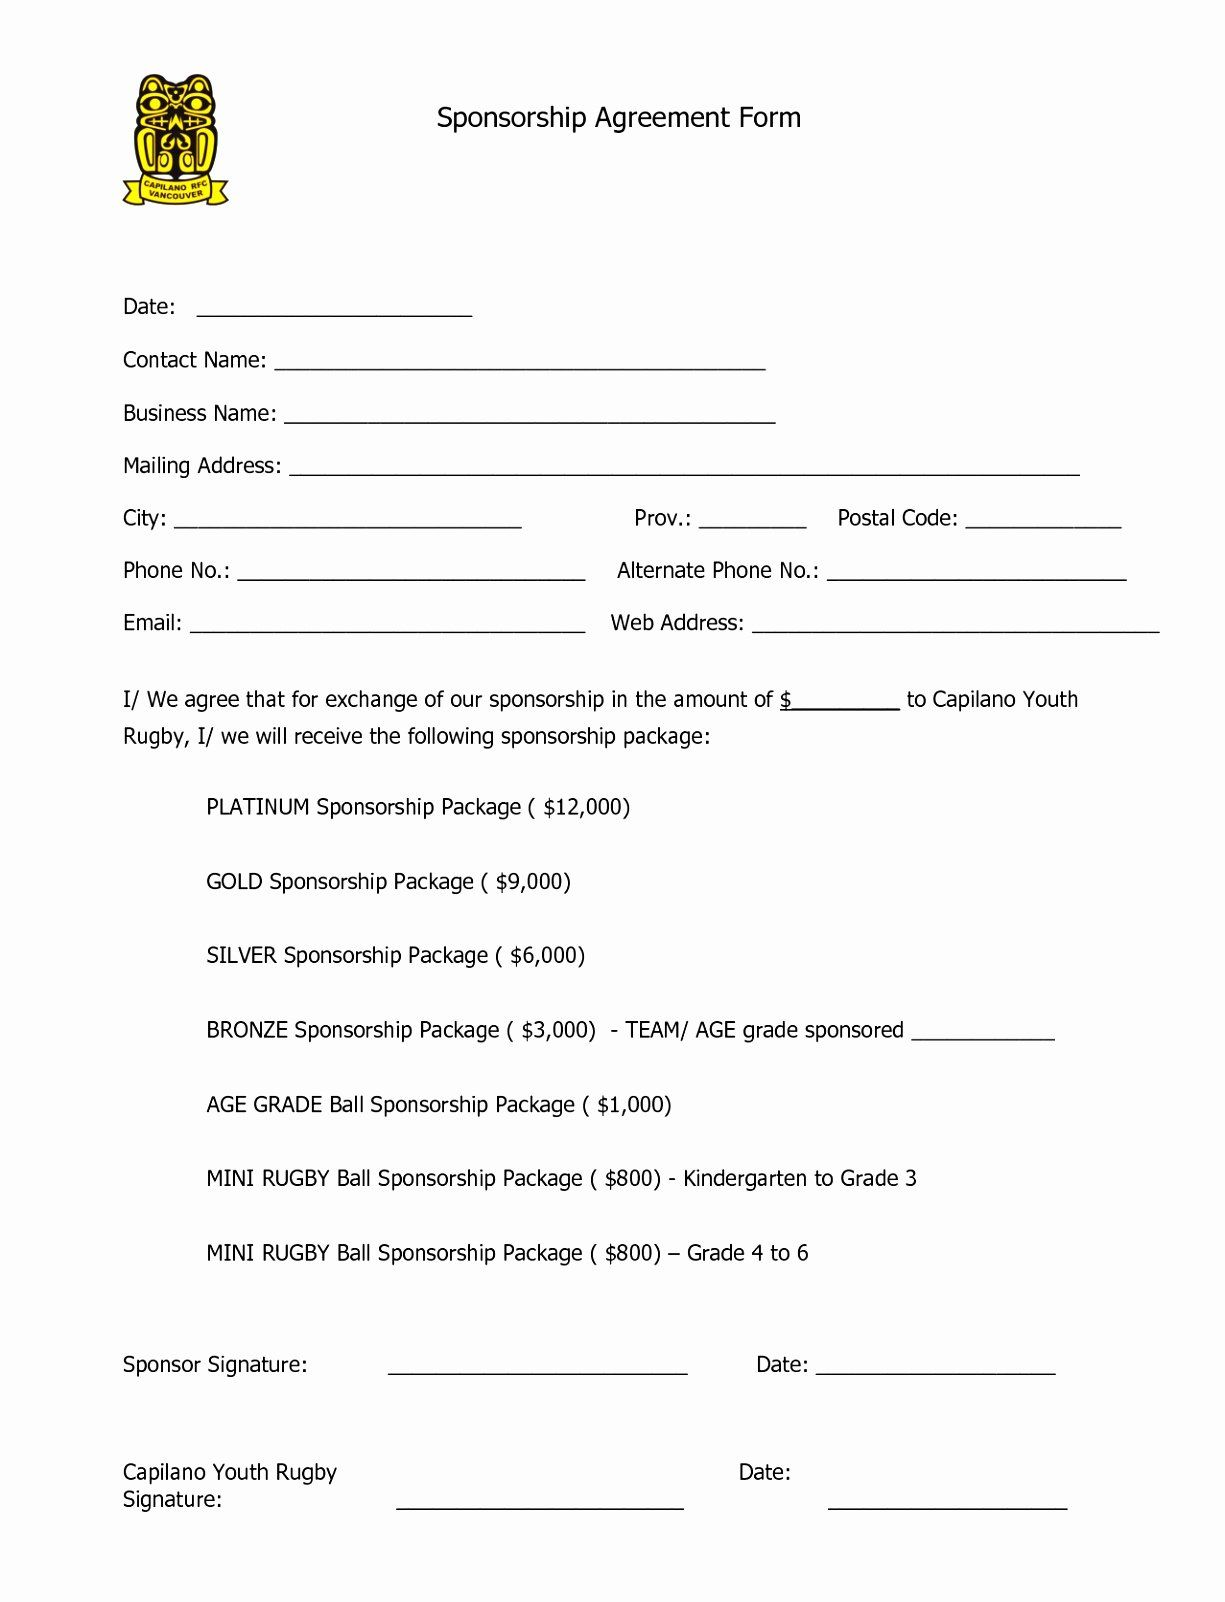 Simple Sponsorship Agreement Template In 2020 Sponsorship Form